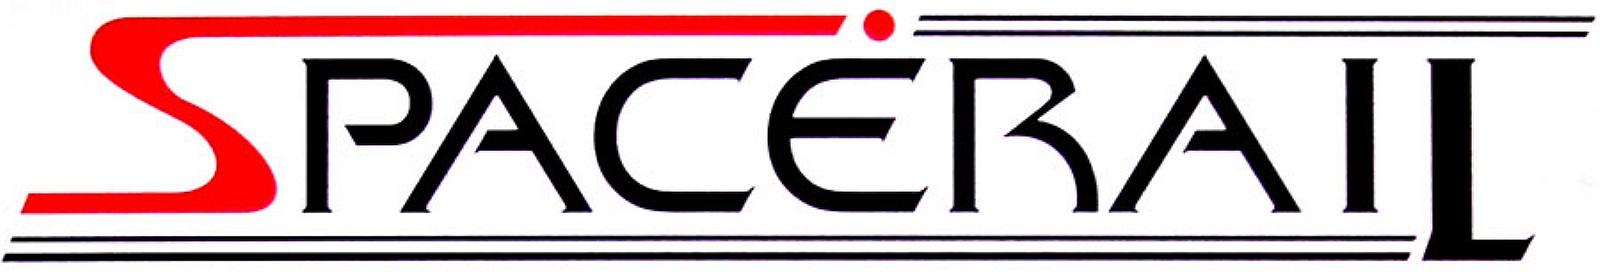 Spacerail - logo